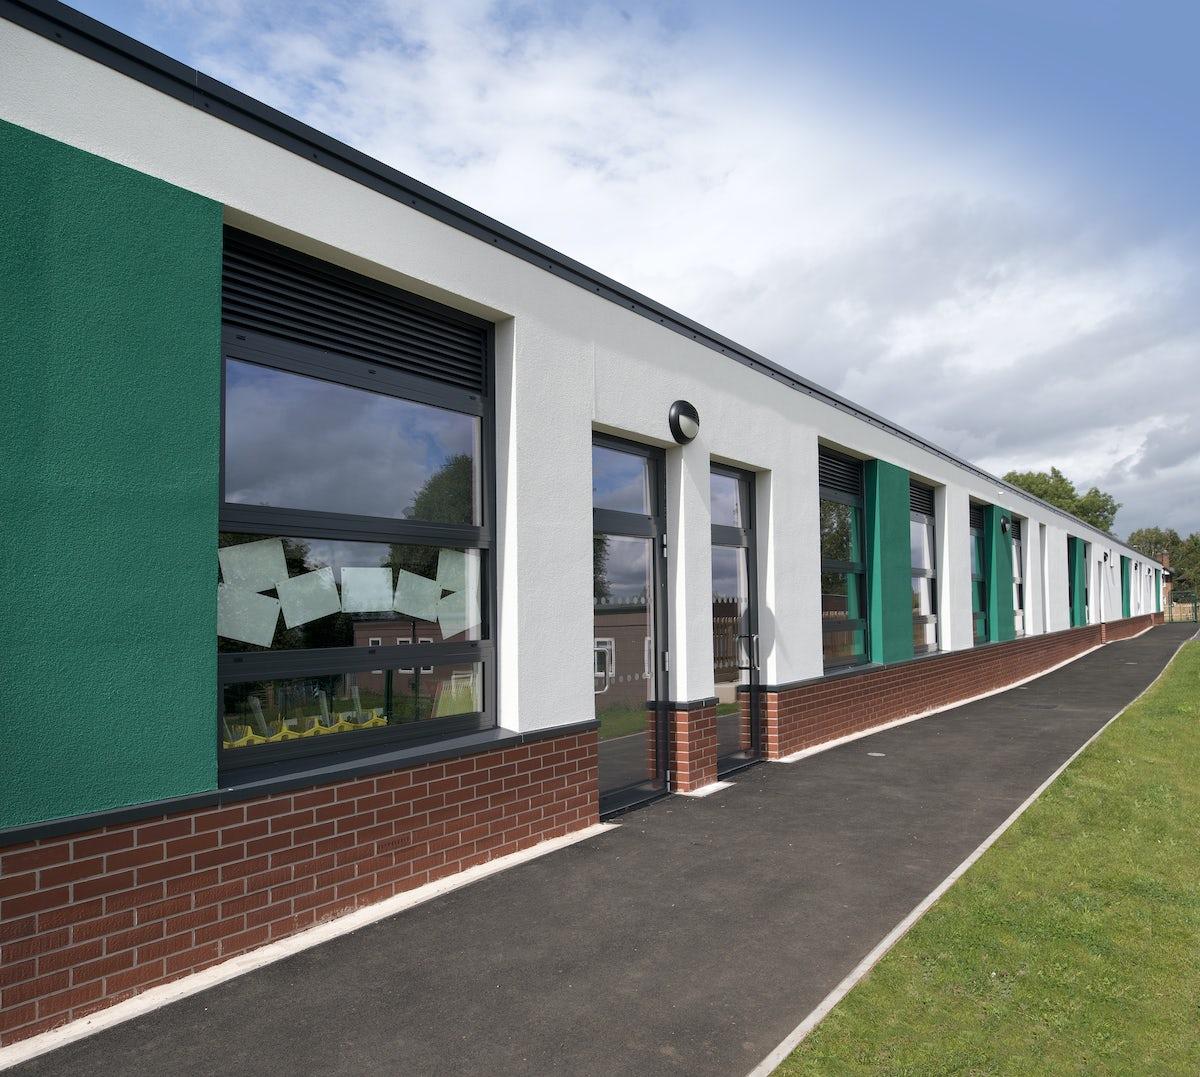 Highclliffe Primary School